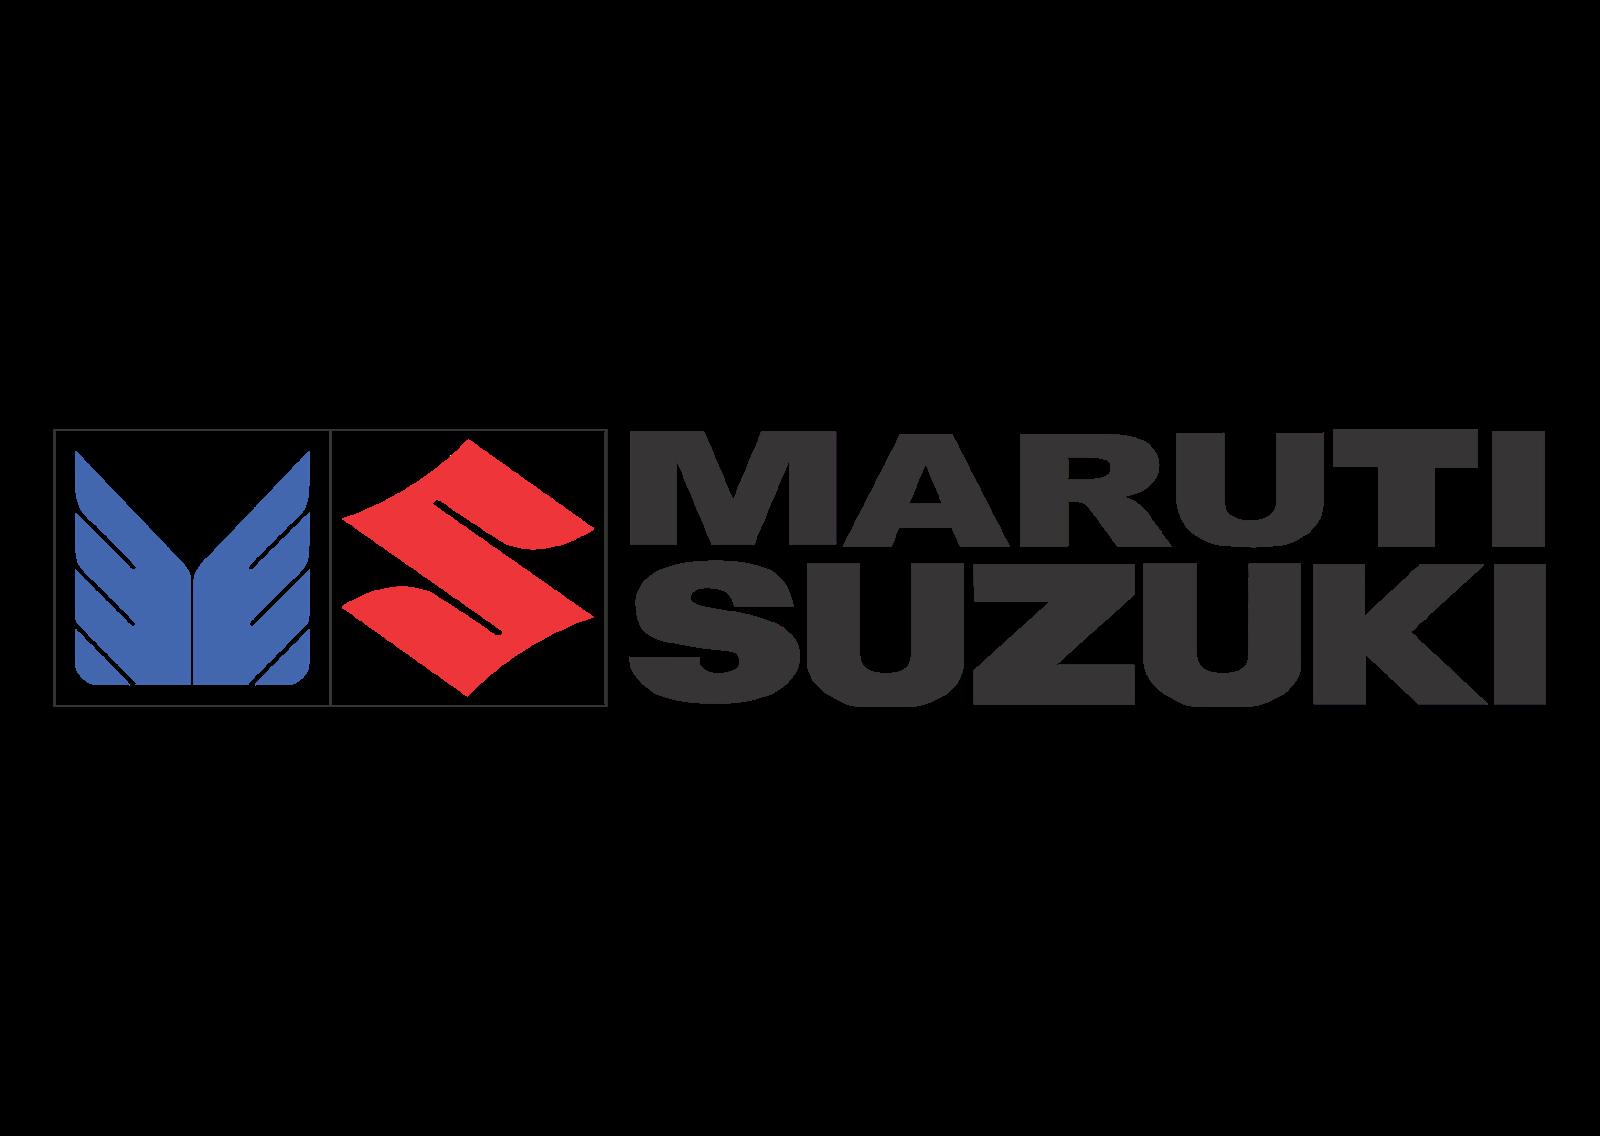 Maruti Suzuki Vector Logo